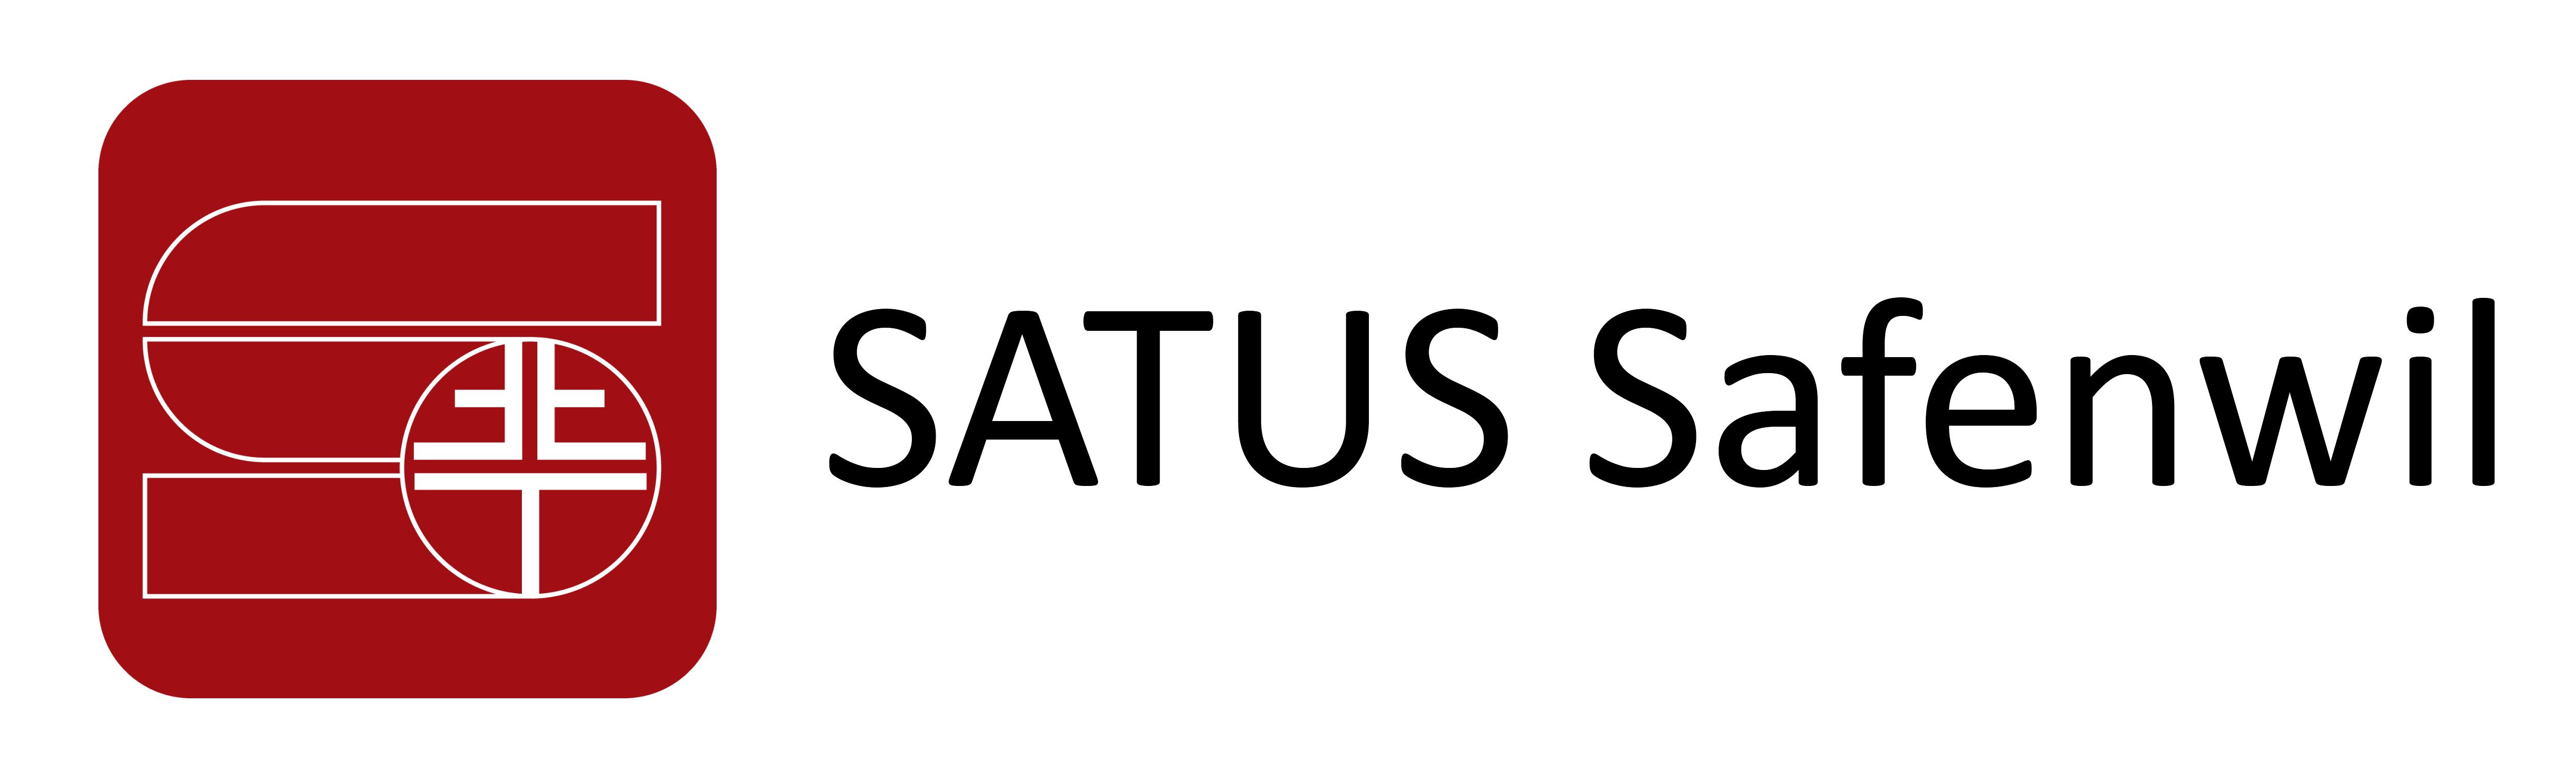 SATUS Safenwil